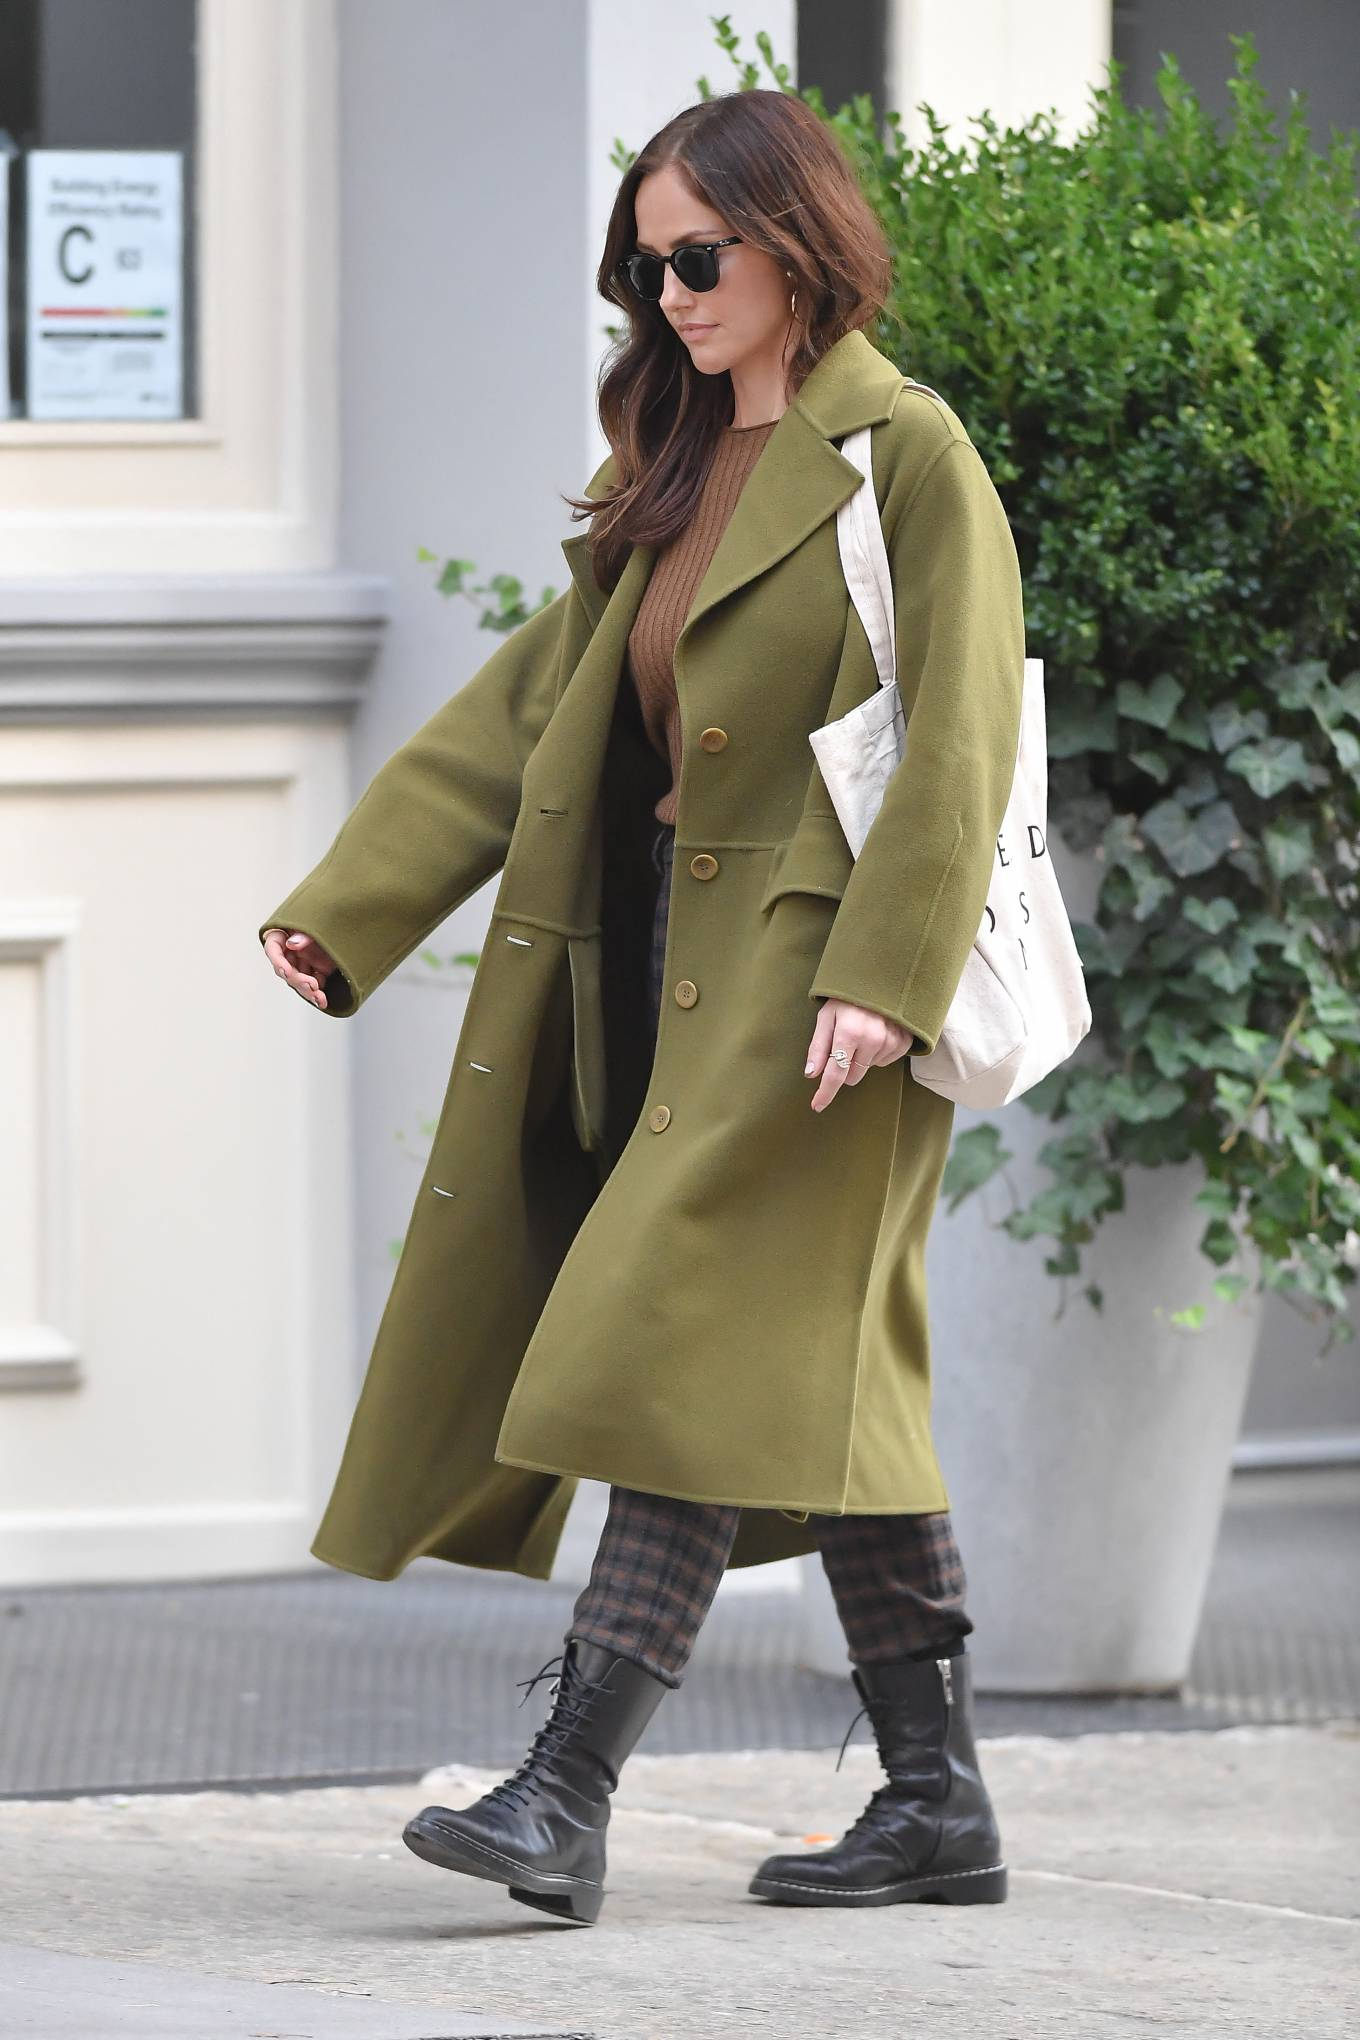 Minka Kelly 2021 : Minka Kelly – In olive green runs errands in New York-10